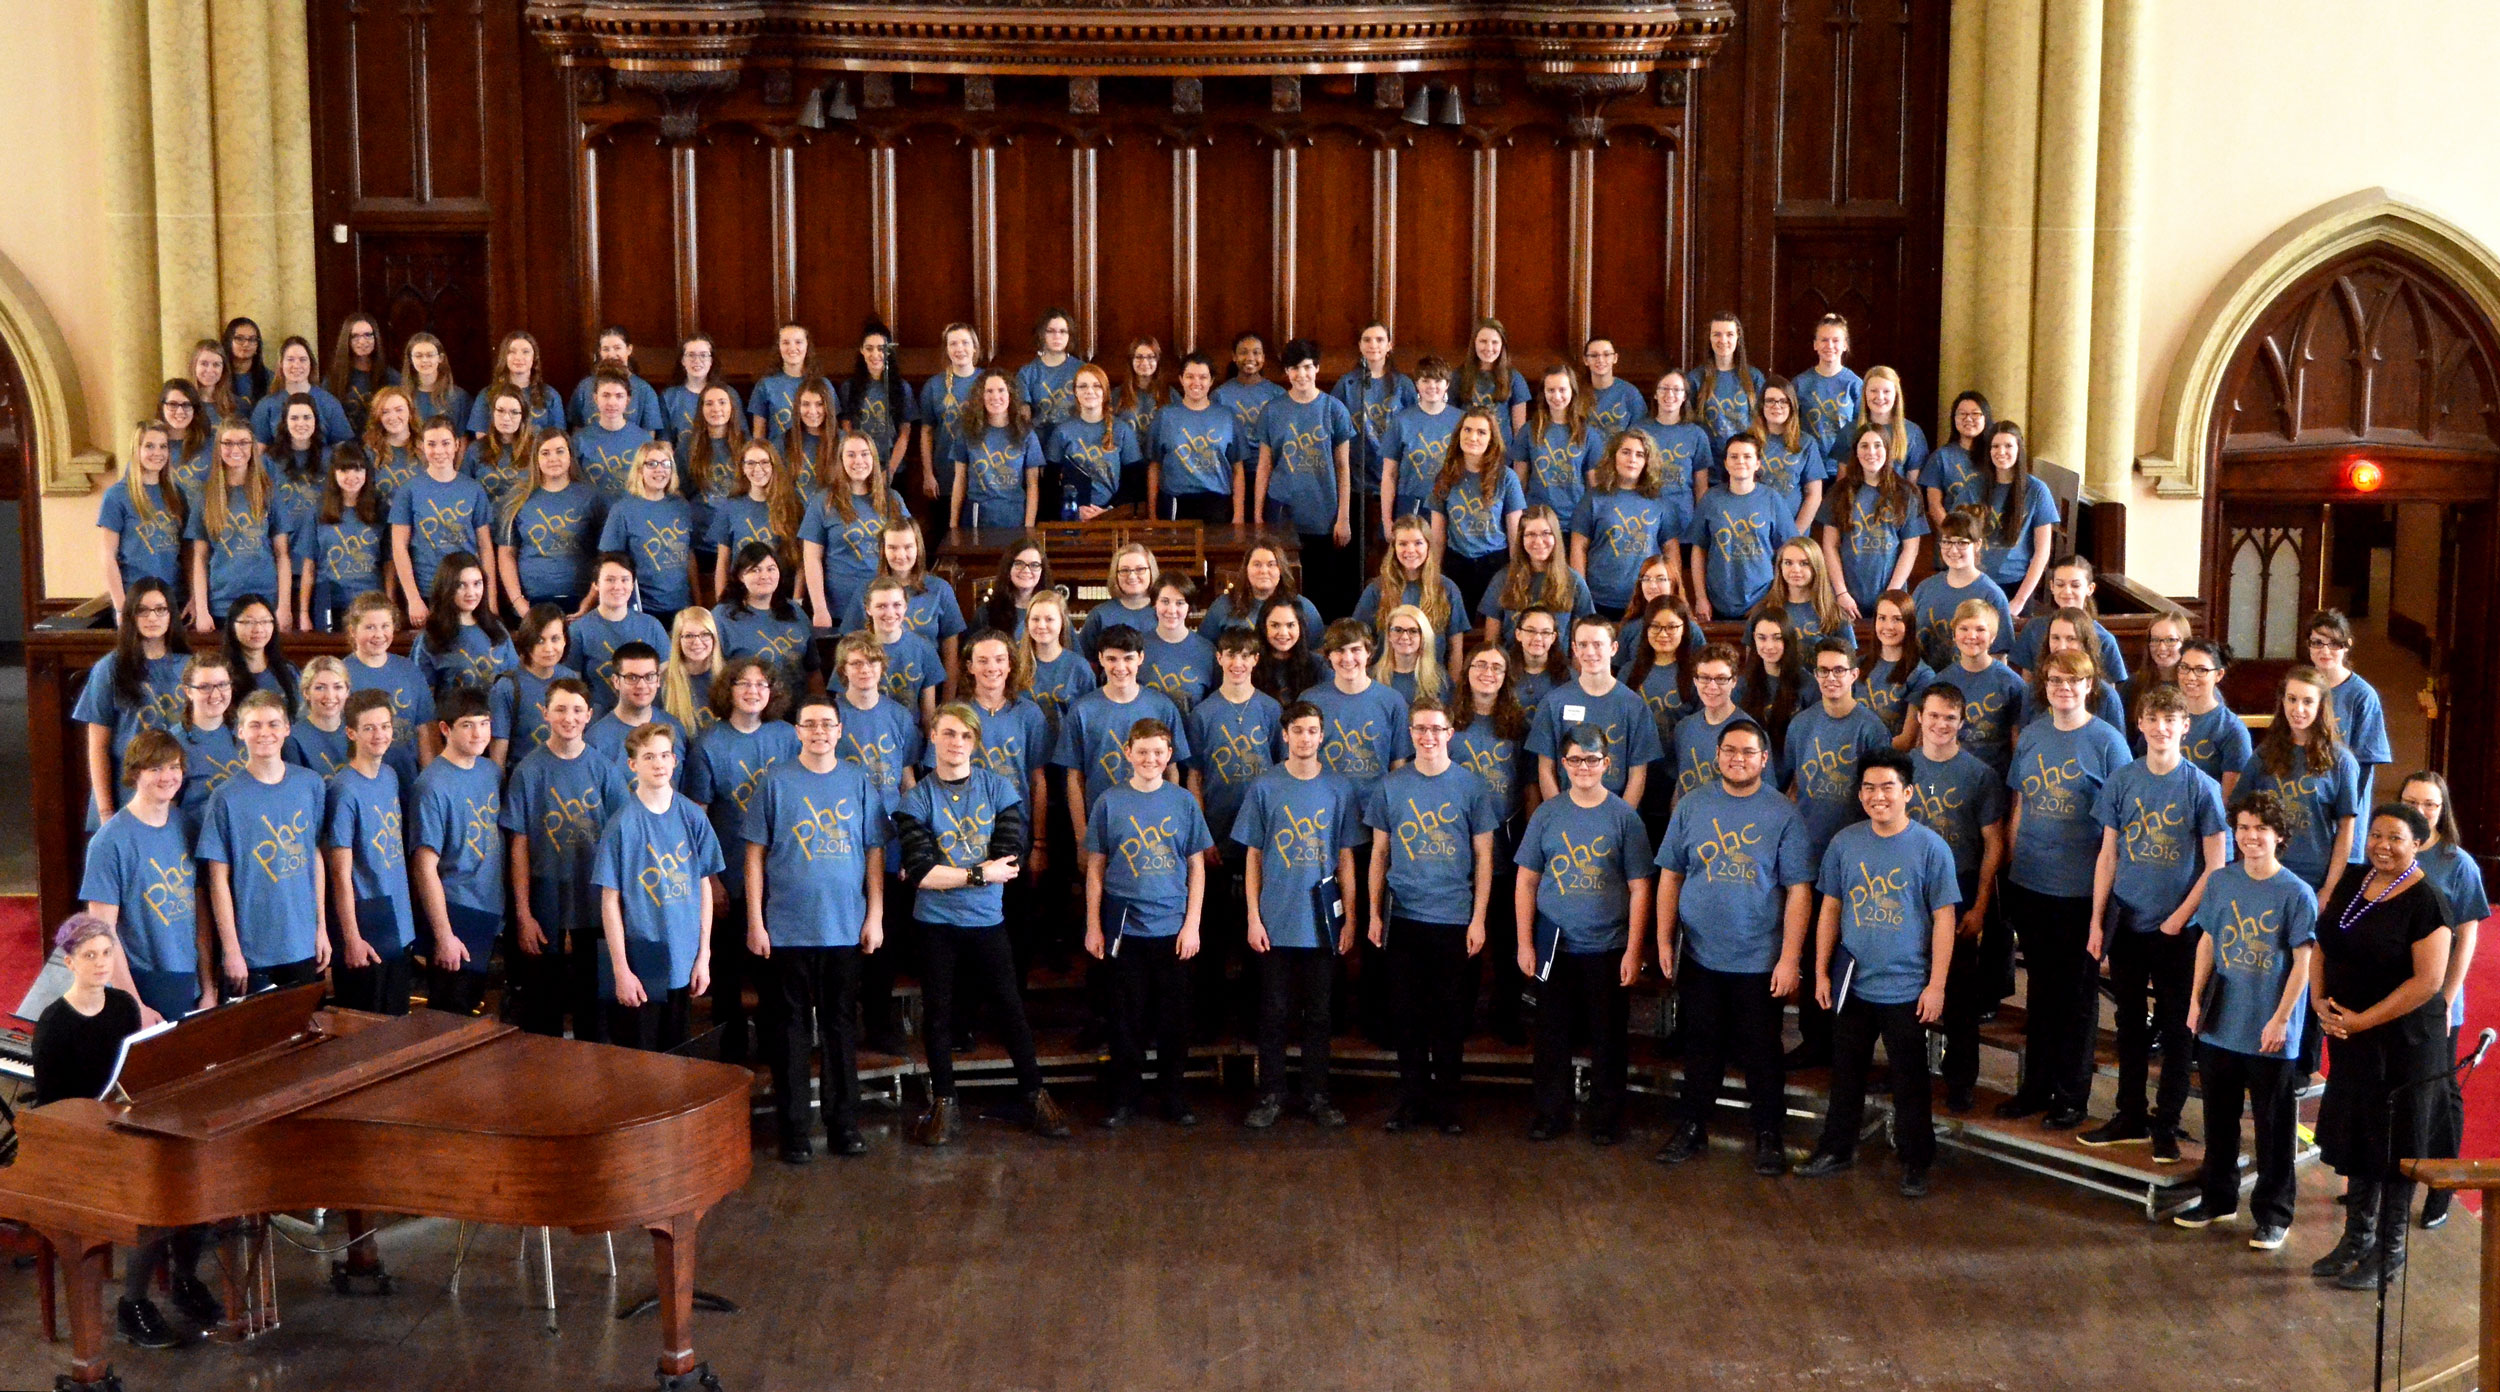 PHC 2016 Senior Choir - Cynthia Peyson Wahl, conductor